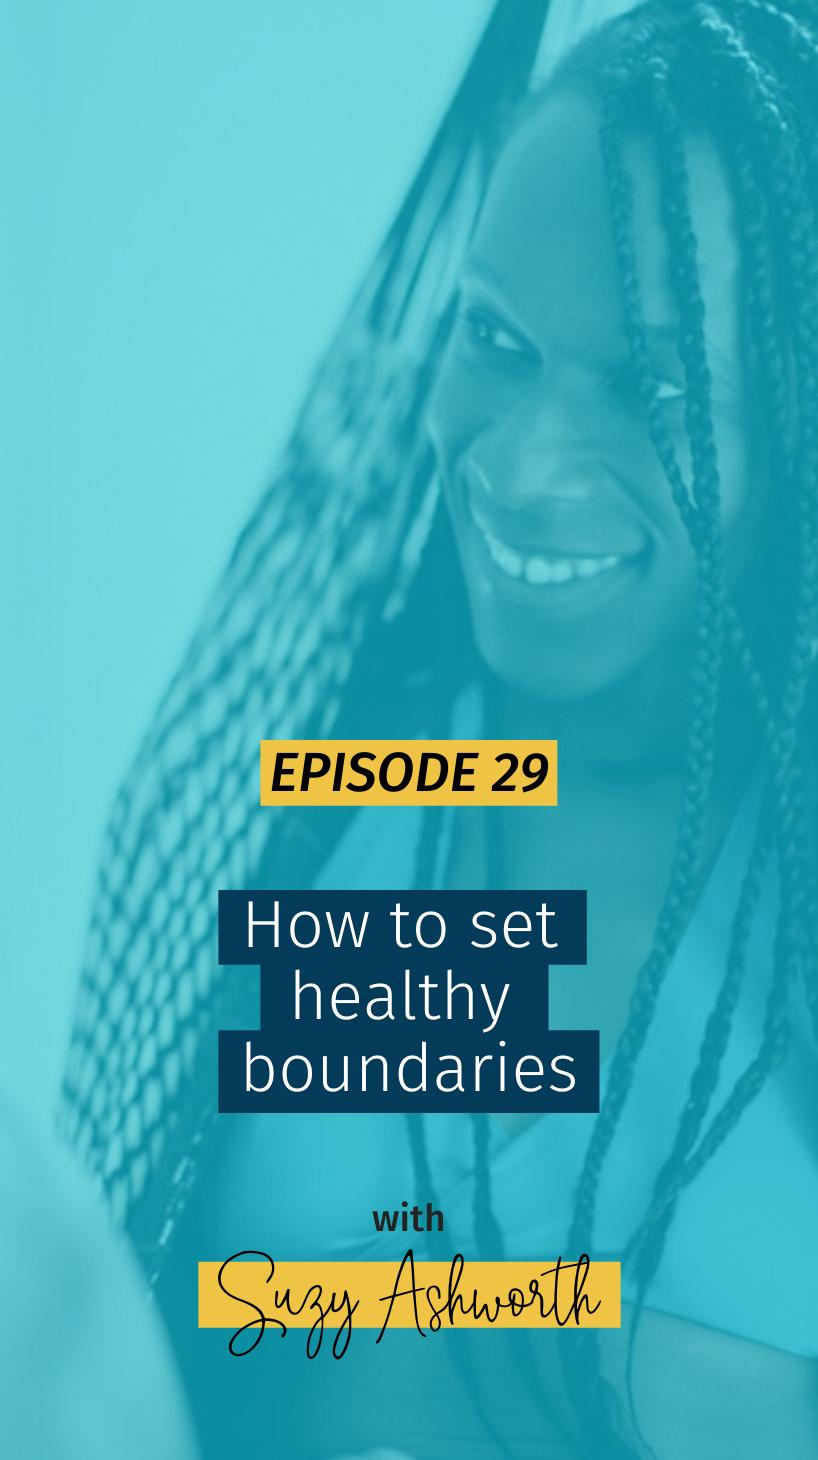 029 How to set healthy boundaries